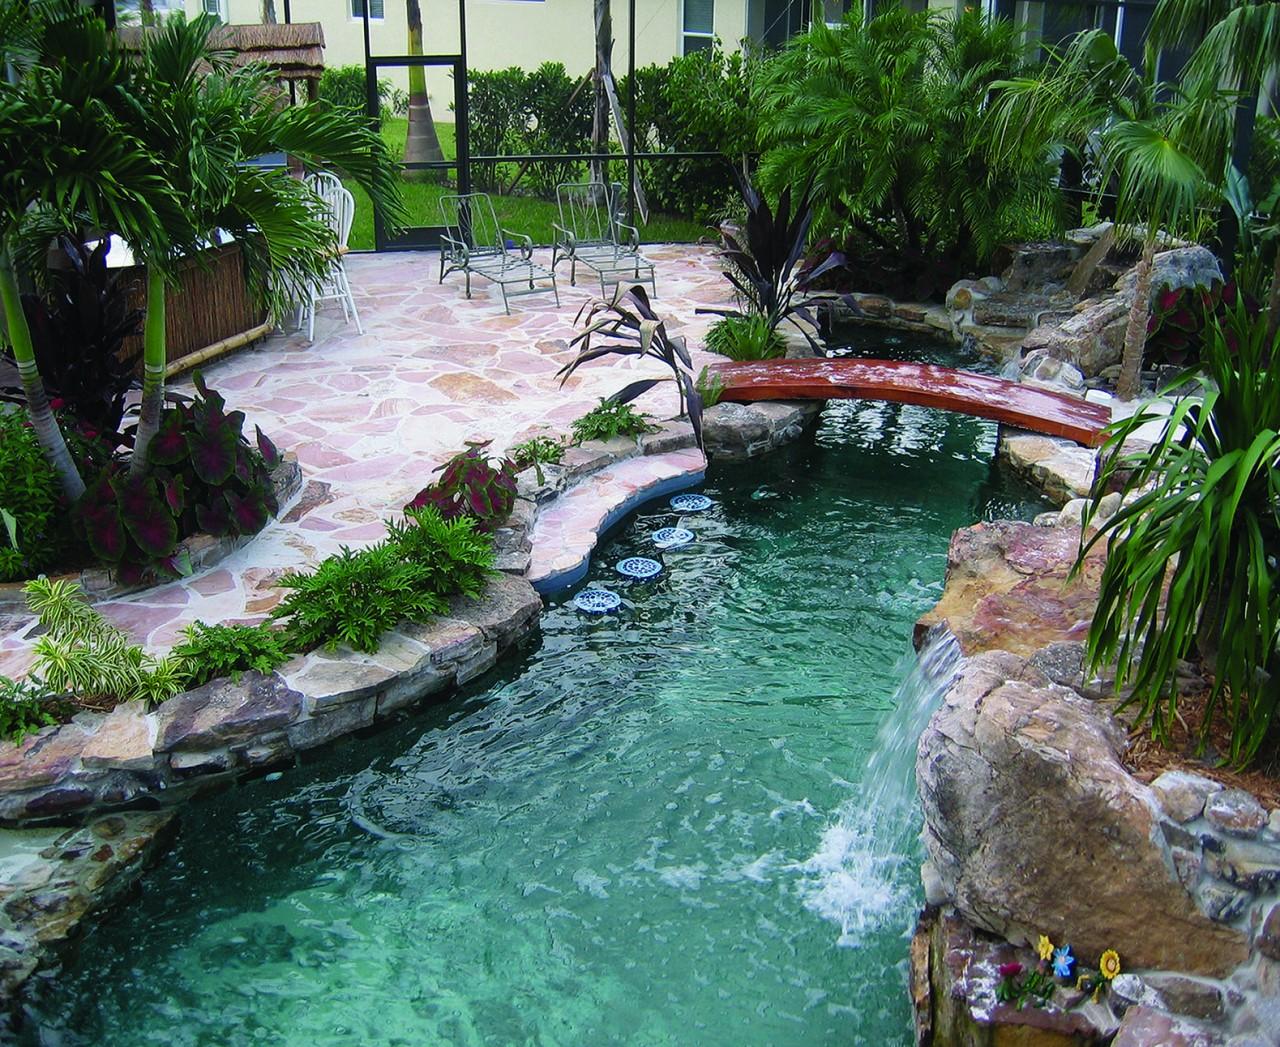 Lucas Lagoons Pool with Sand Bottom Entrance and Bridge